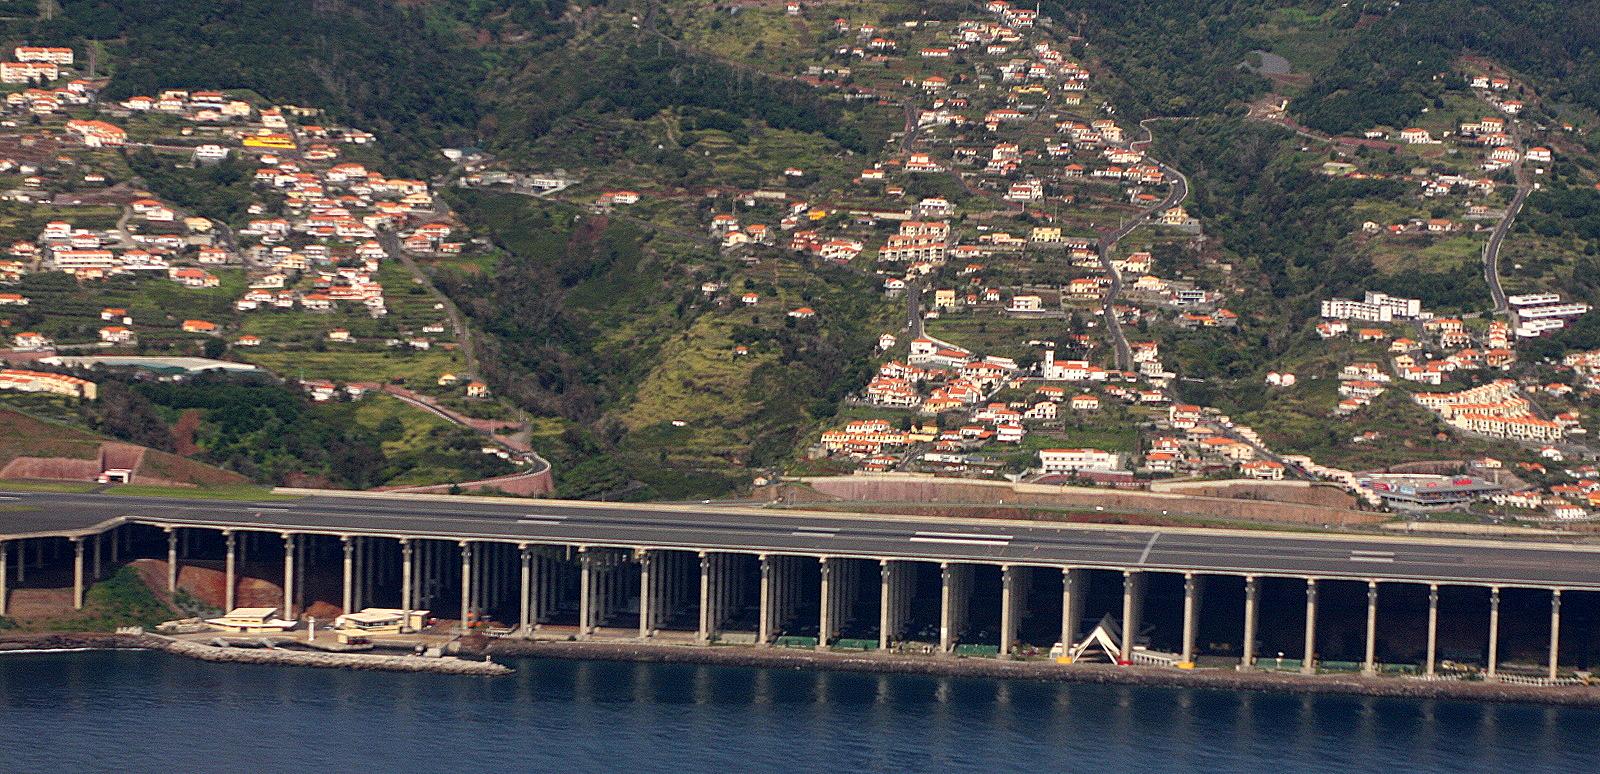 Aeroporto Madeira : File aeroporto da madeira runway g wikimedia commons